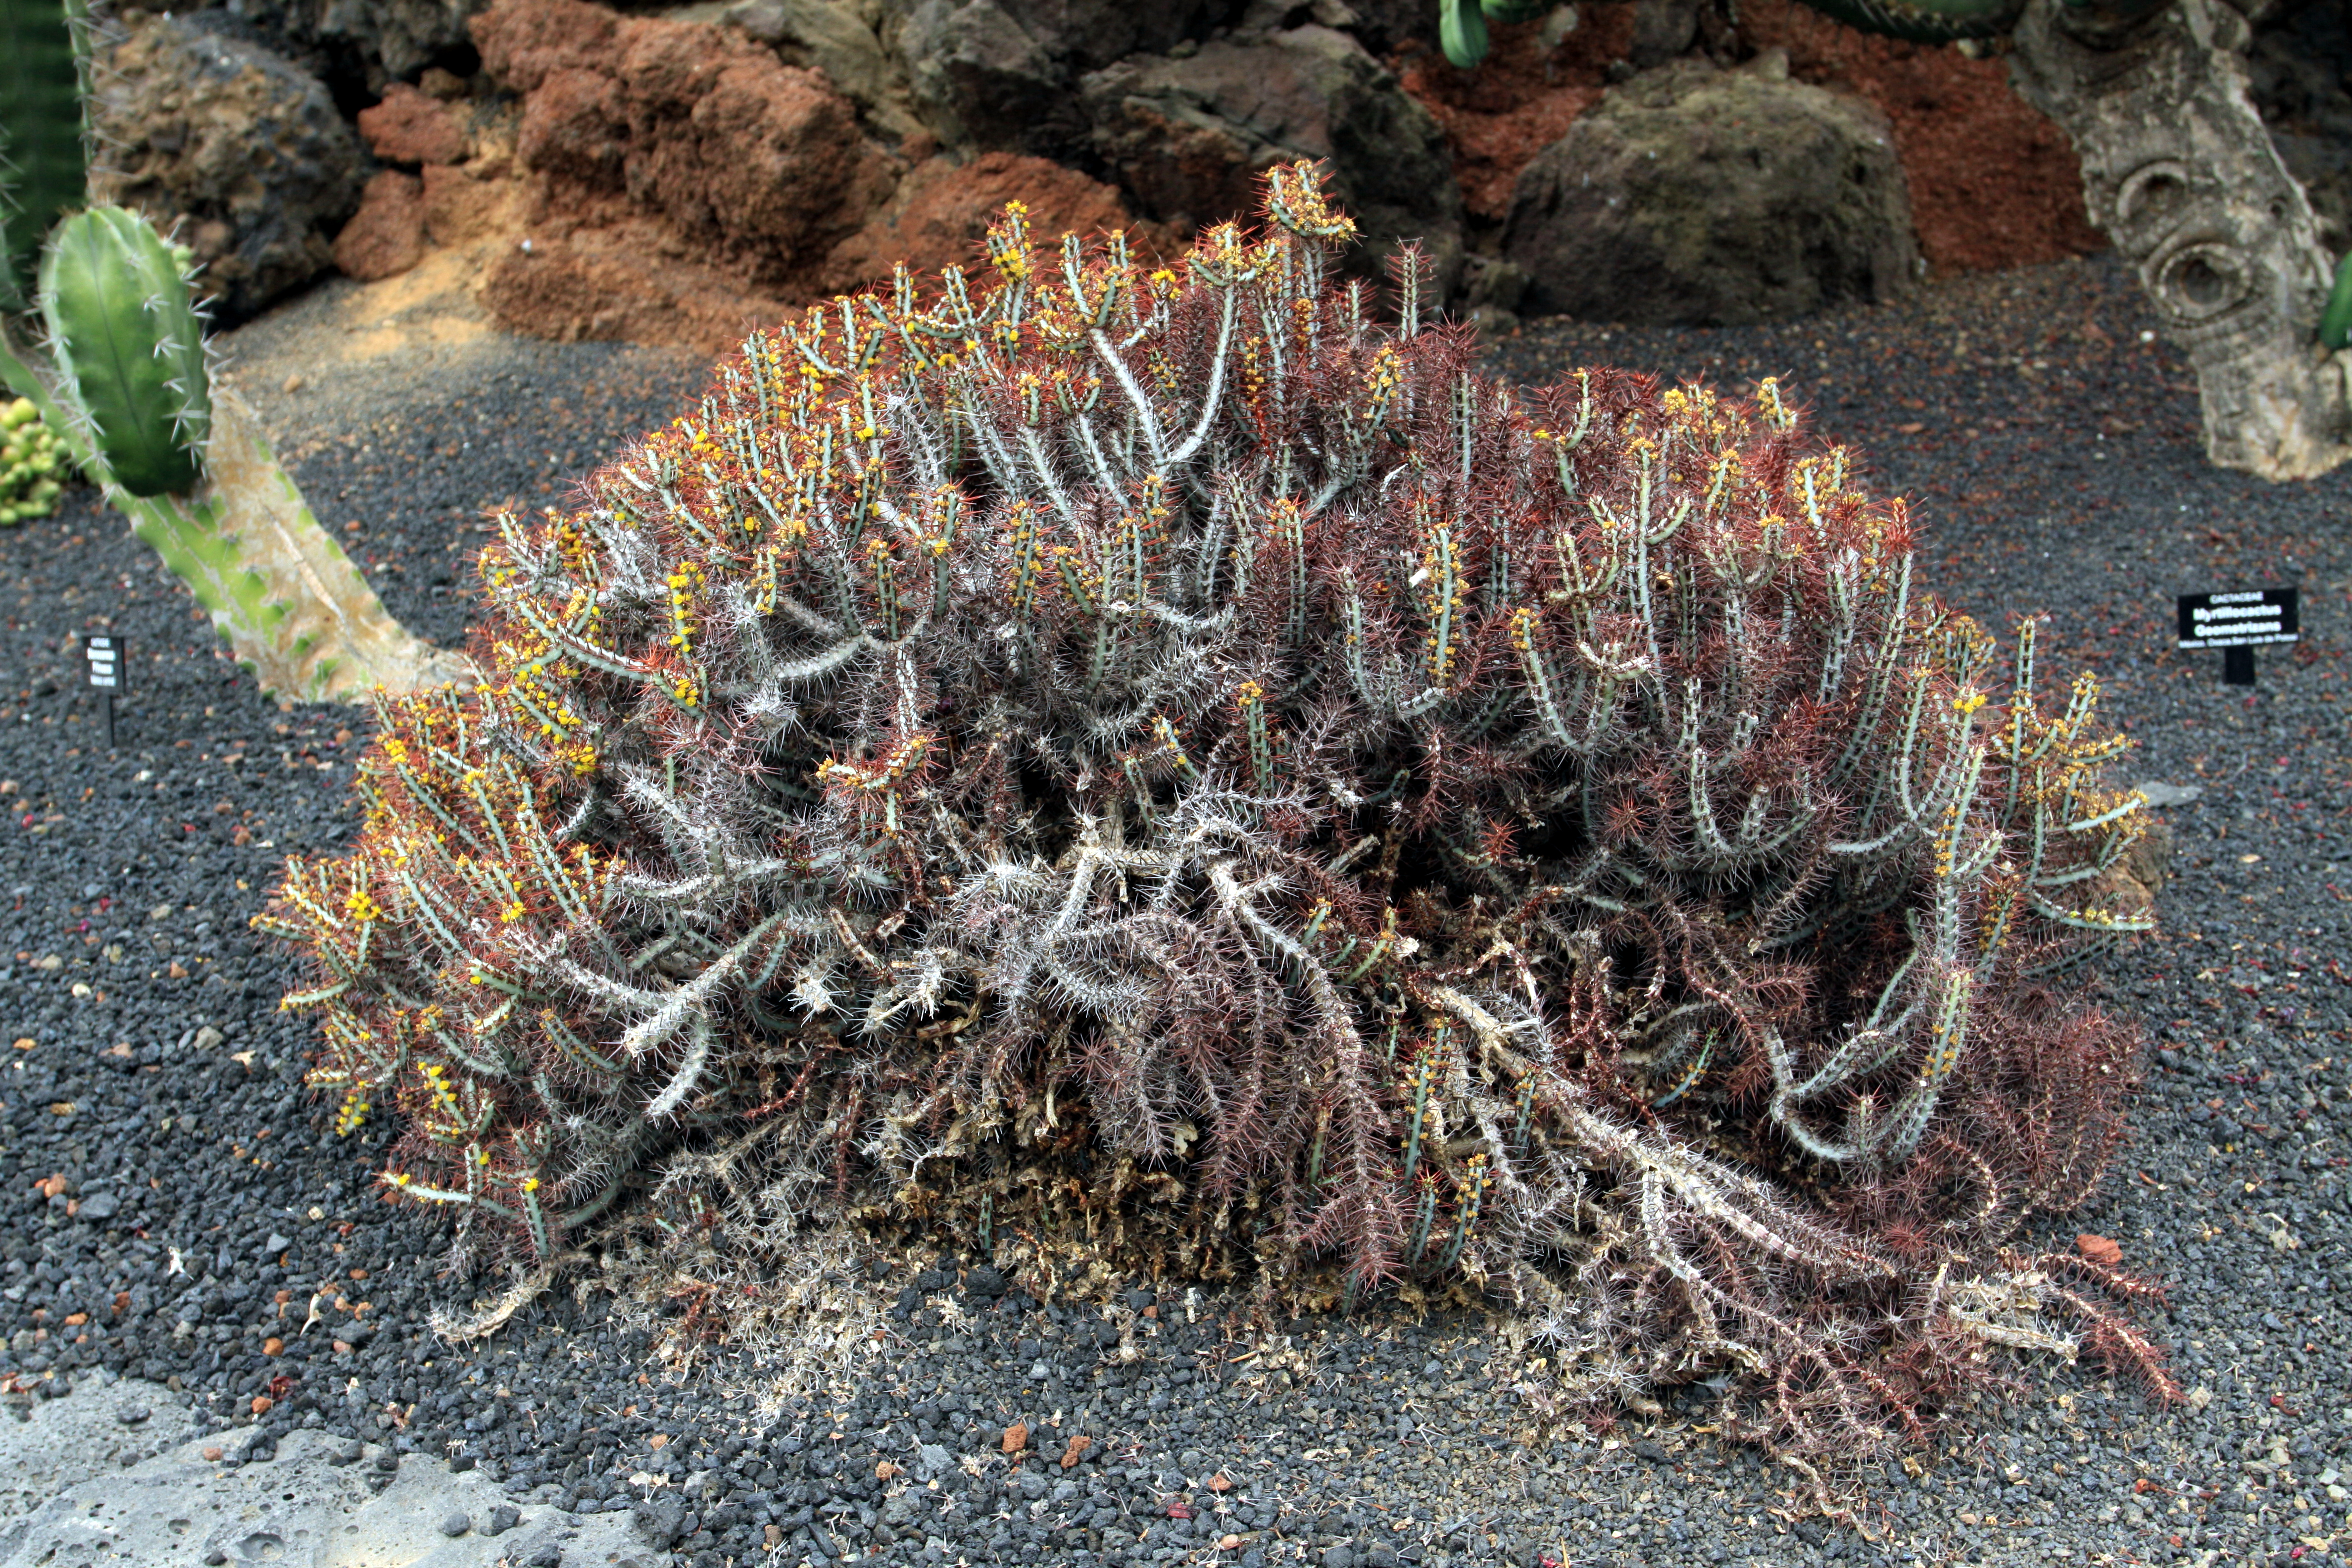 File euphorbia aeruginosa in jardin de cactus on lanzarote for Jardin de cactus lanzarote